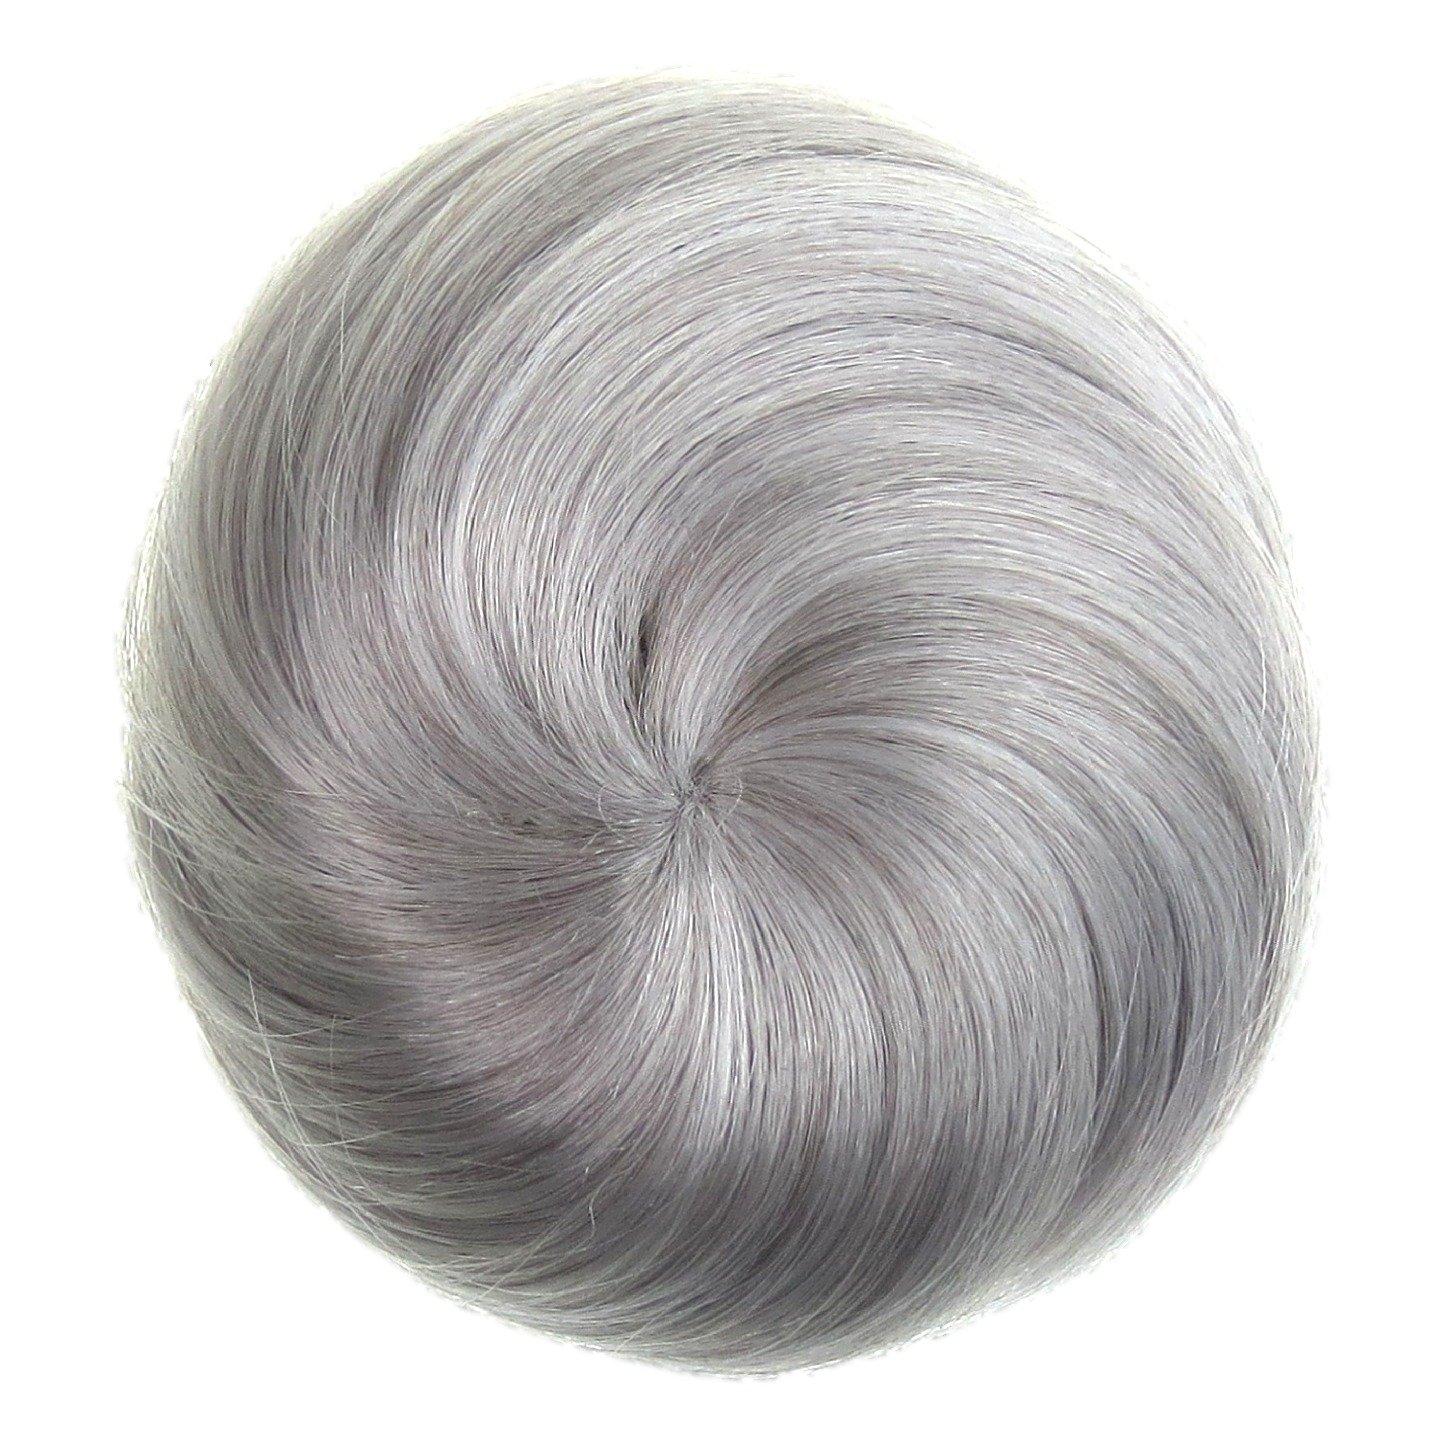 New Style Bun Up Do Side Bun Ballerina Bun Honey Blonde Brown Mix Tight Or Messy Or Even Top Knot Vanessa Grey Hair Designs